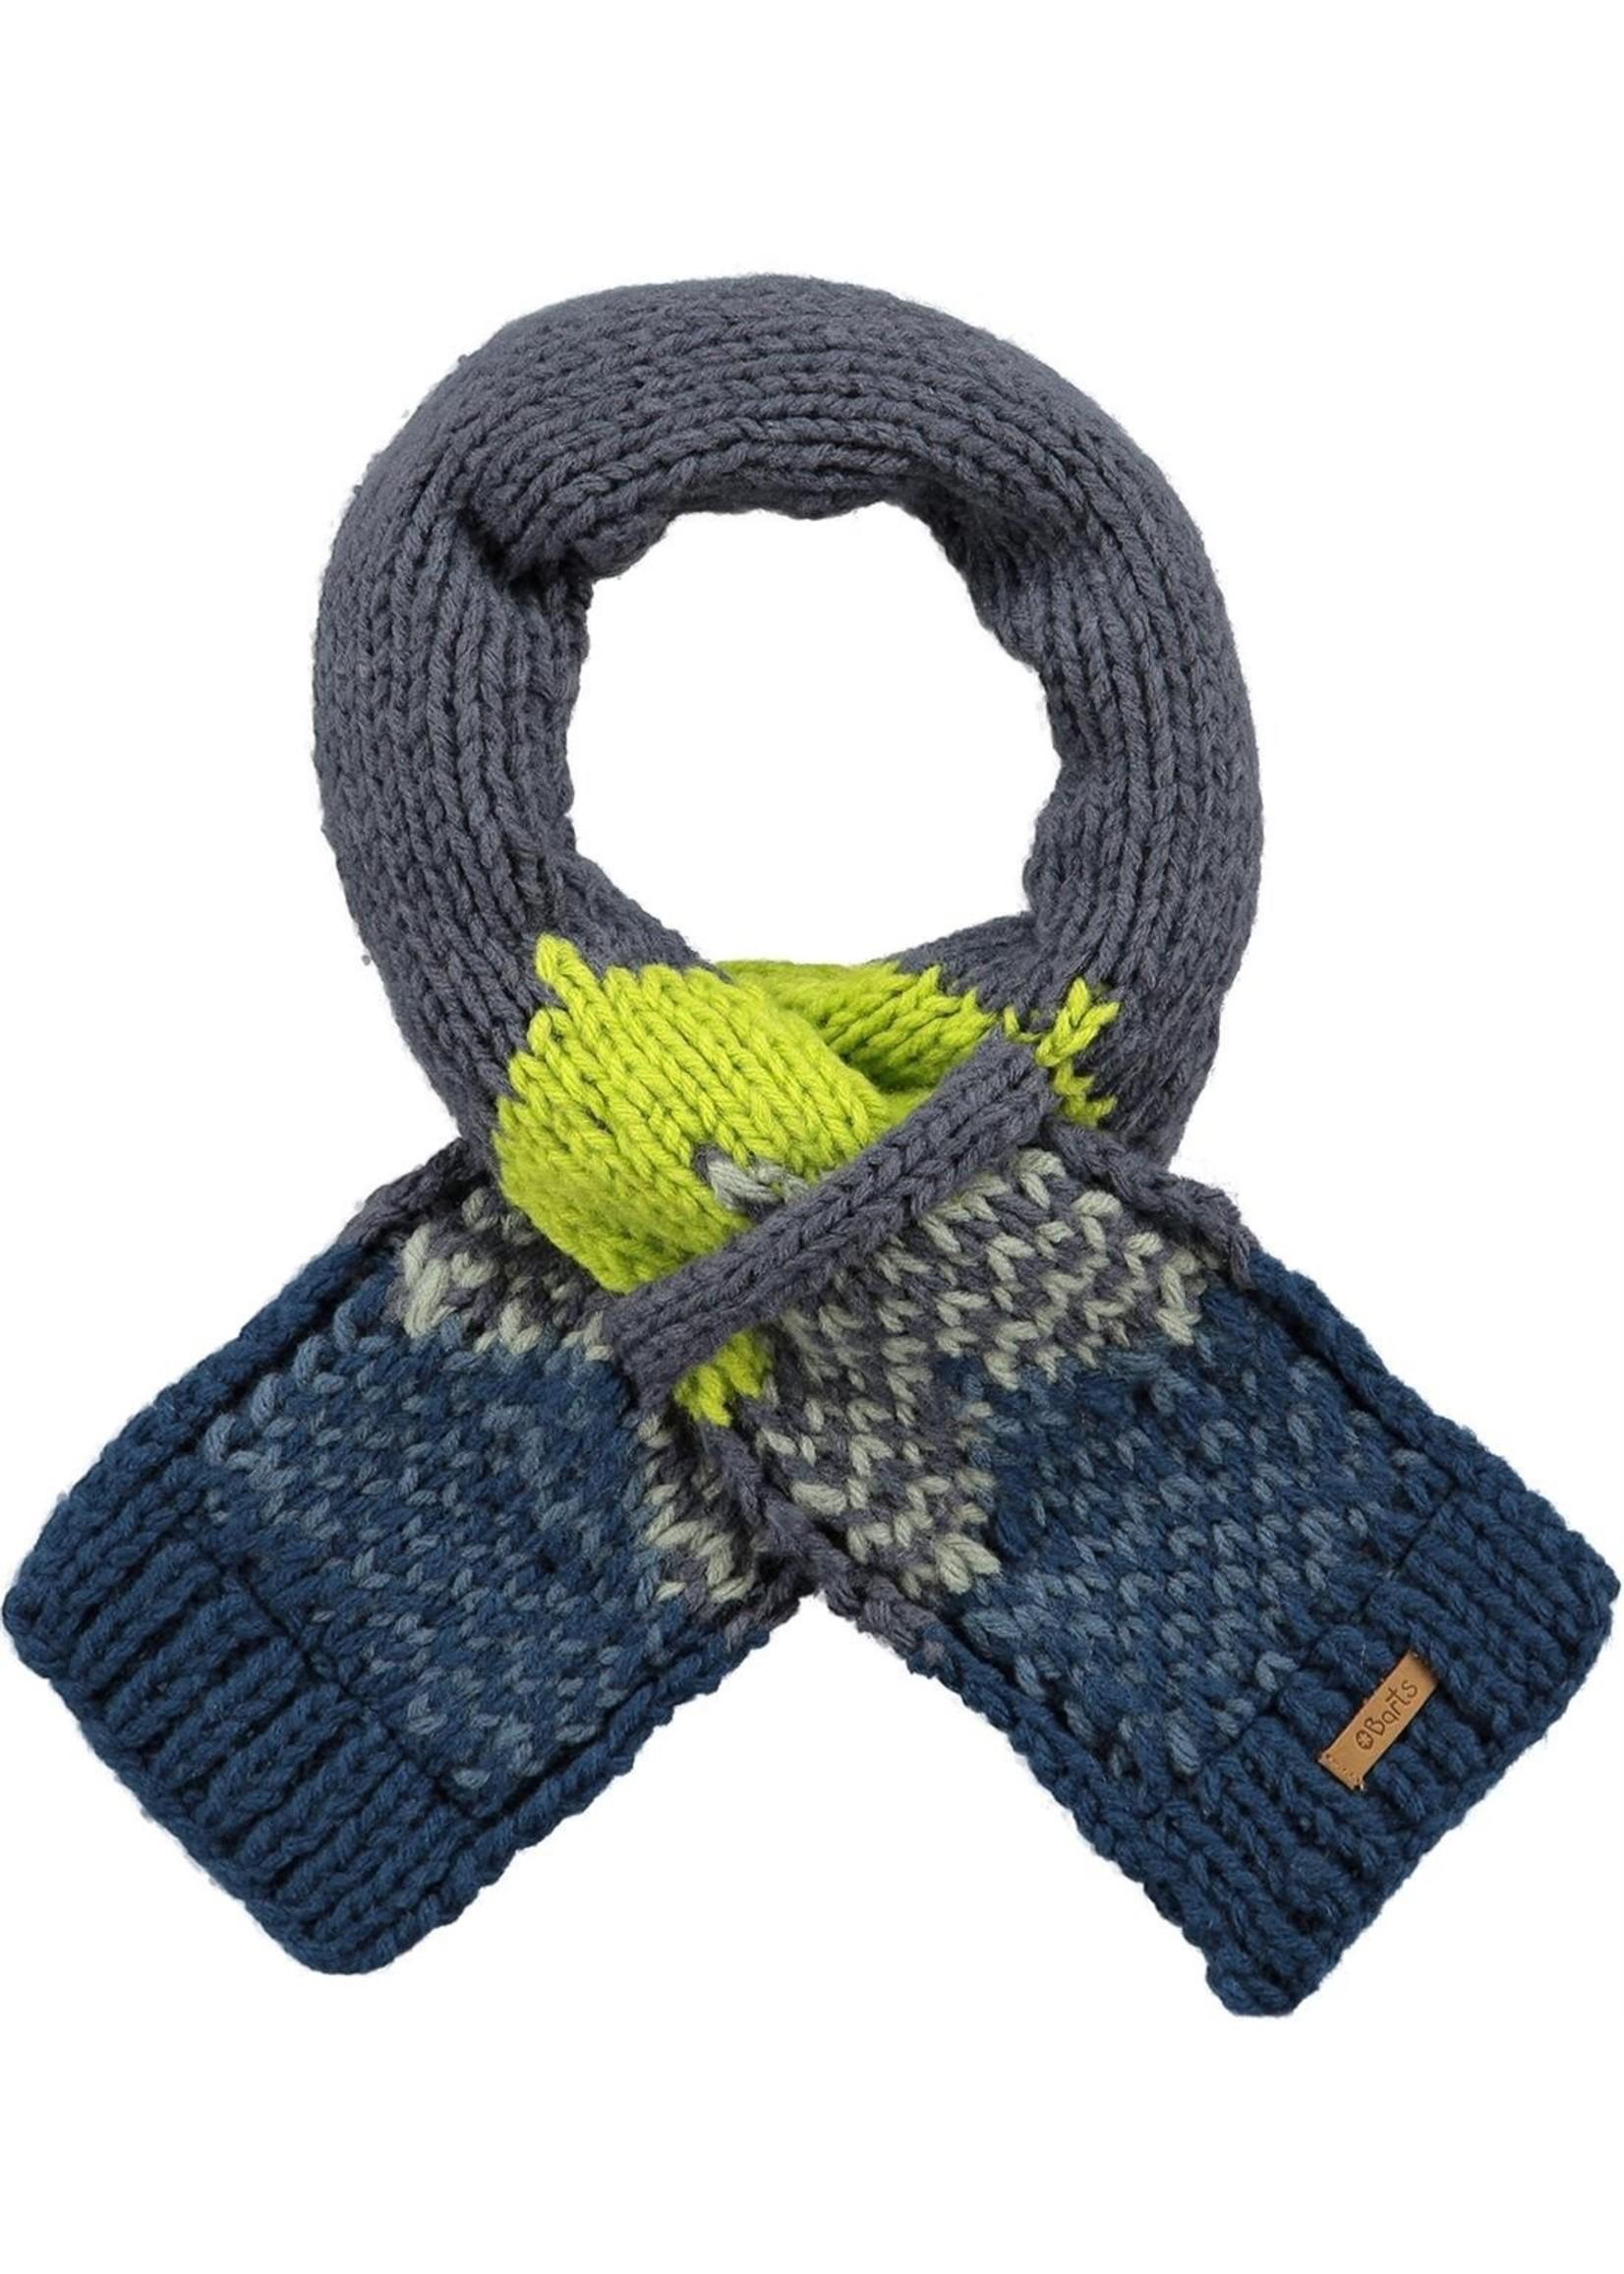 Barts w21 sjaal maat one size (74/92)